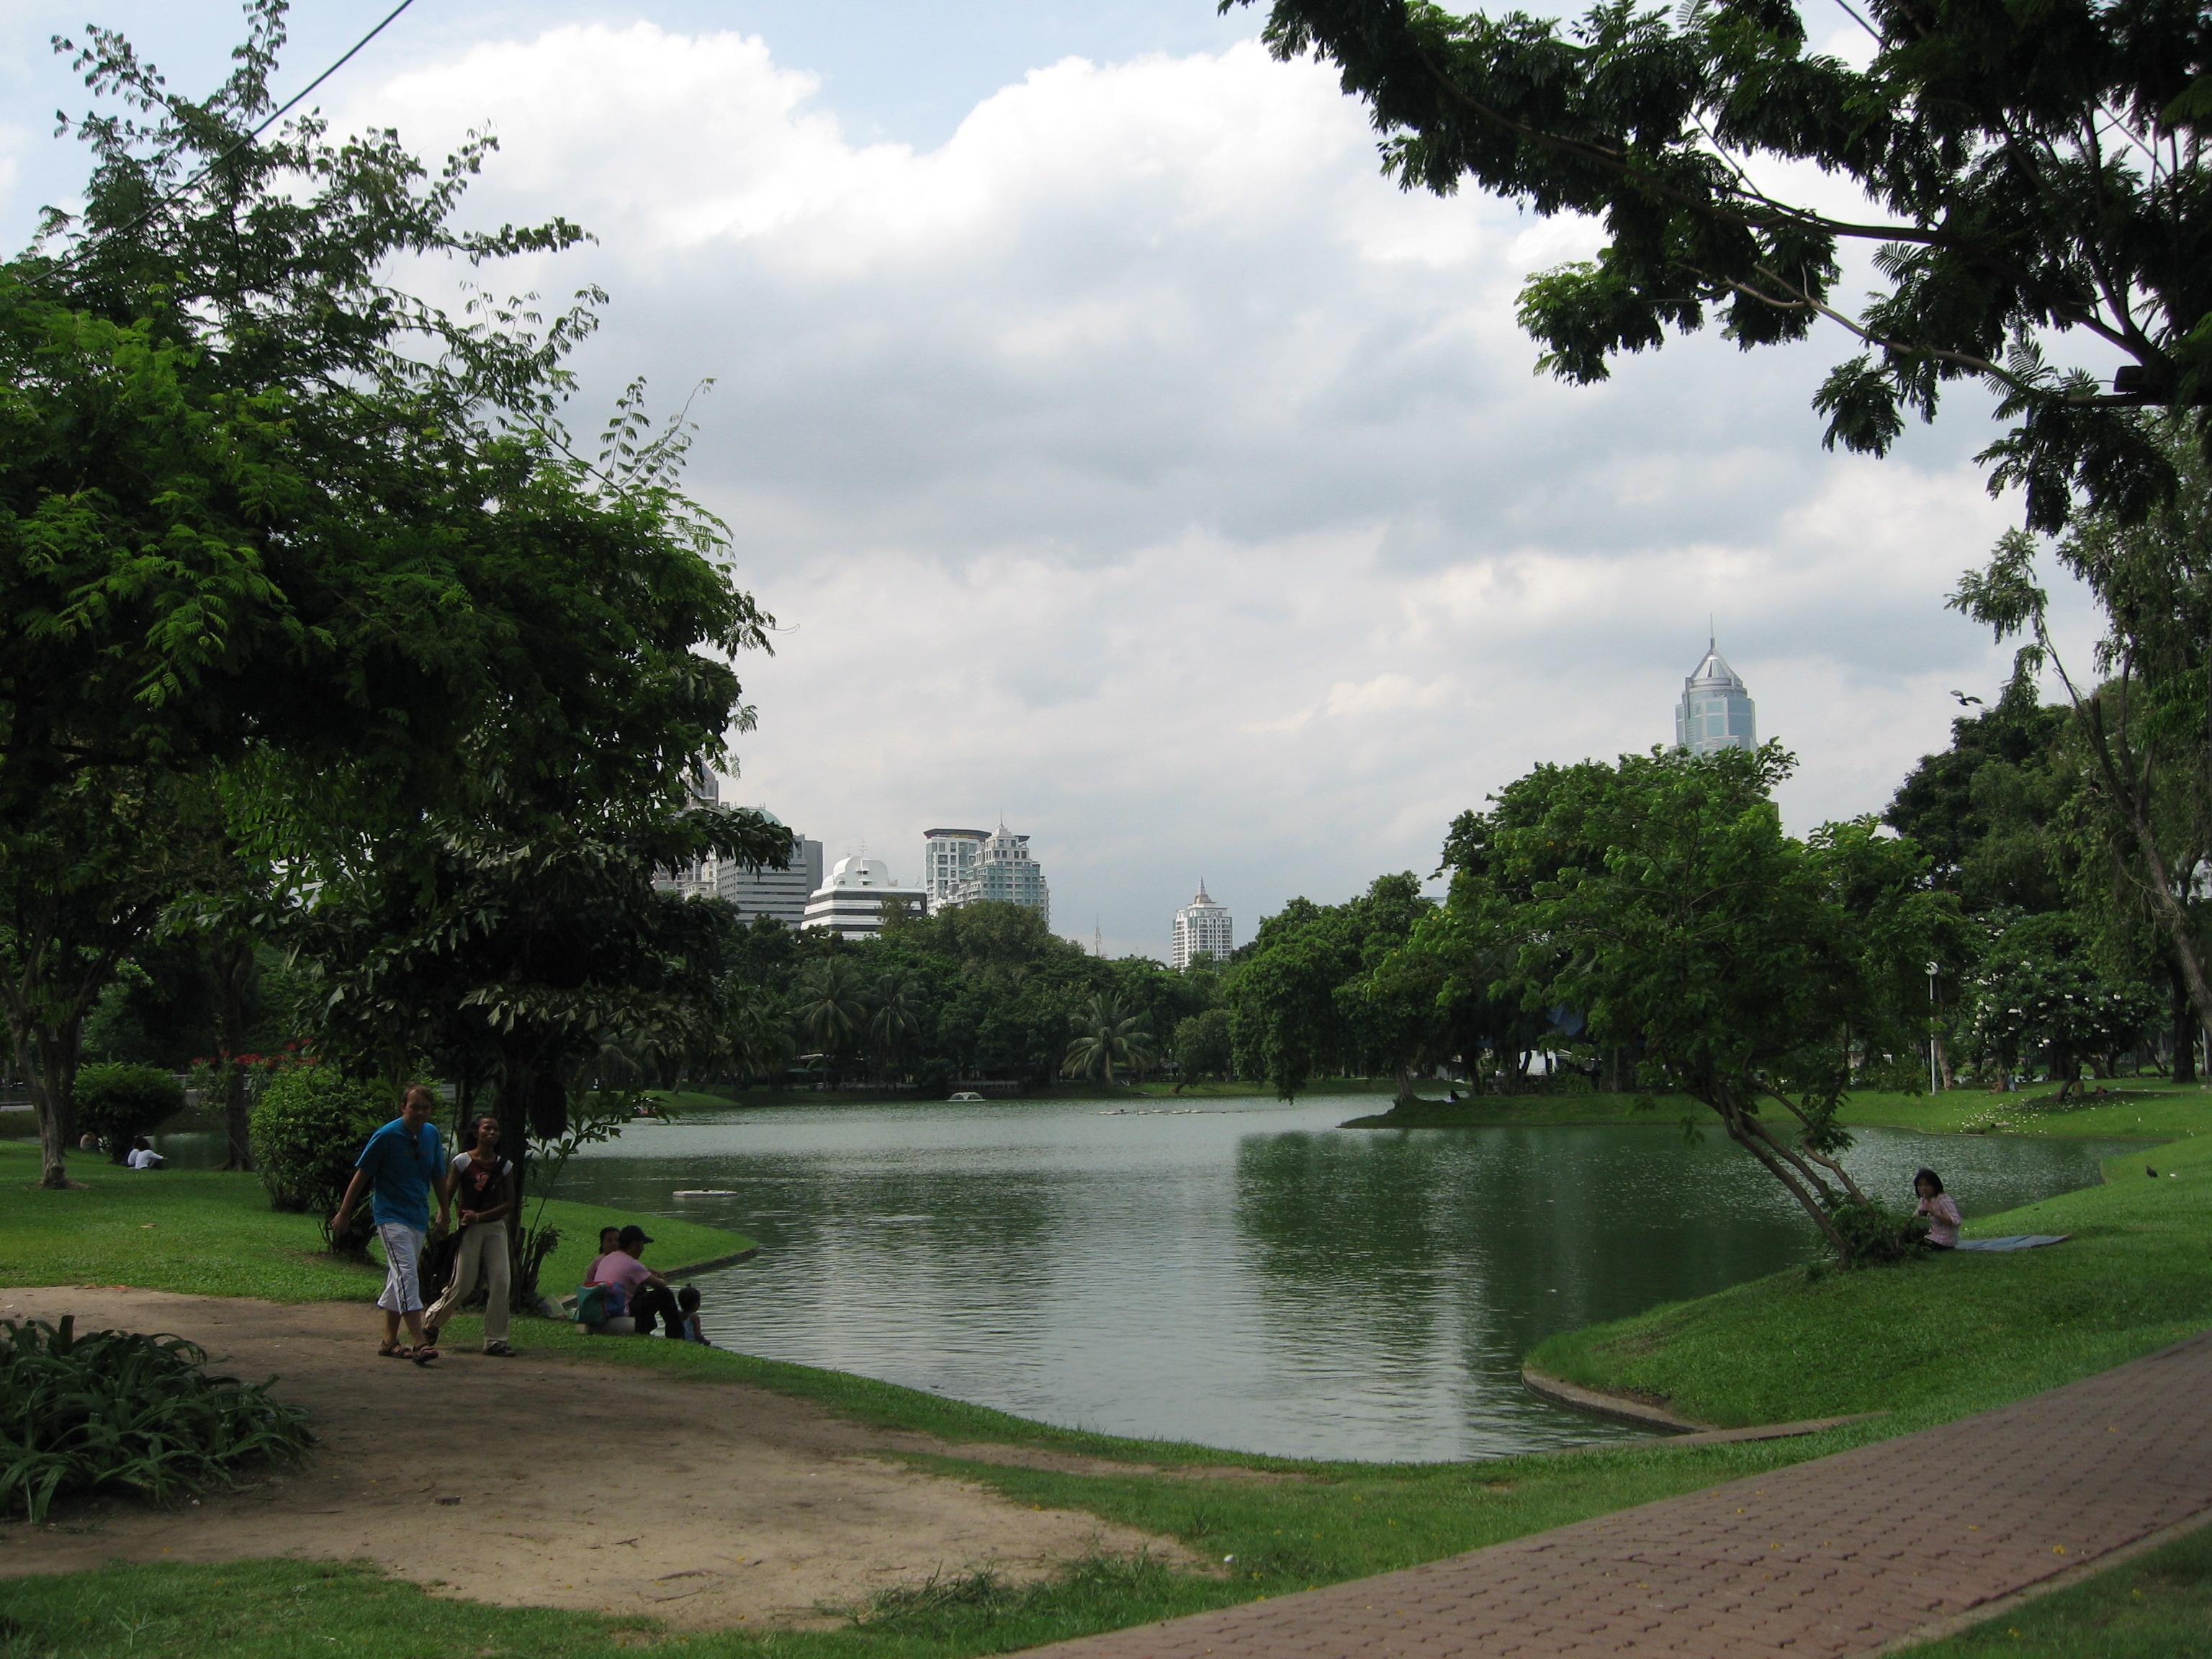 File:Lumphini Park.jpg - Wikimedia Commons